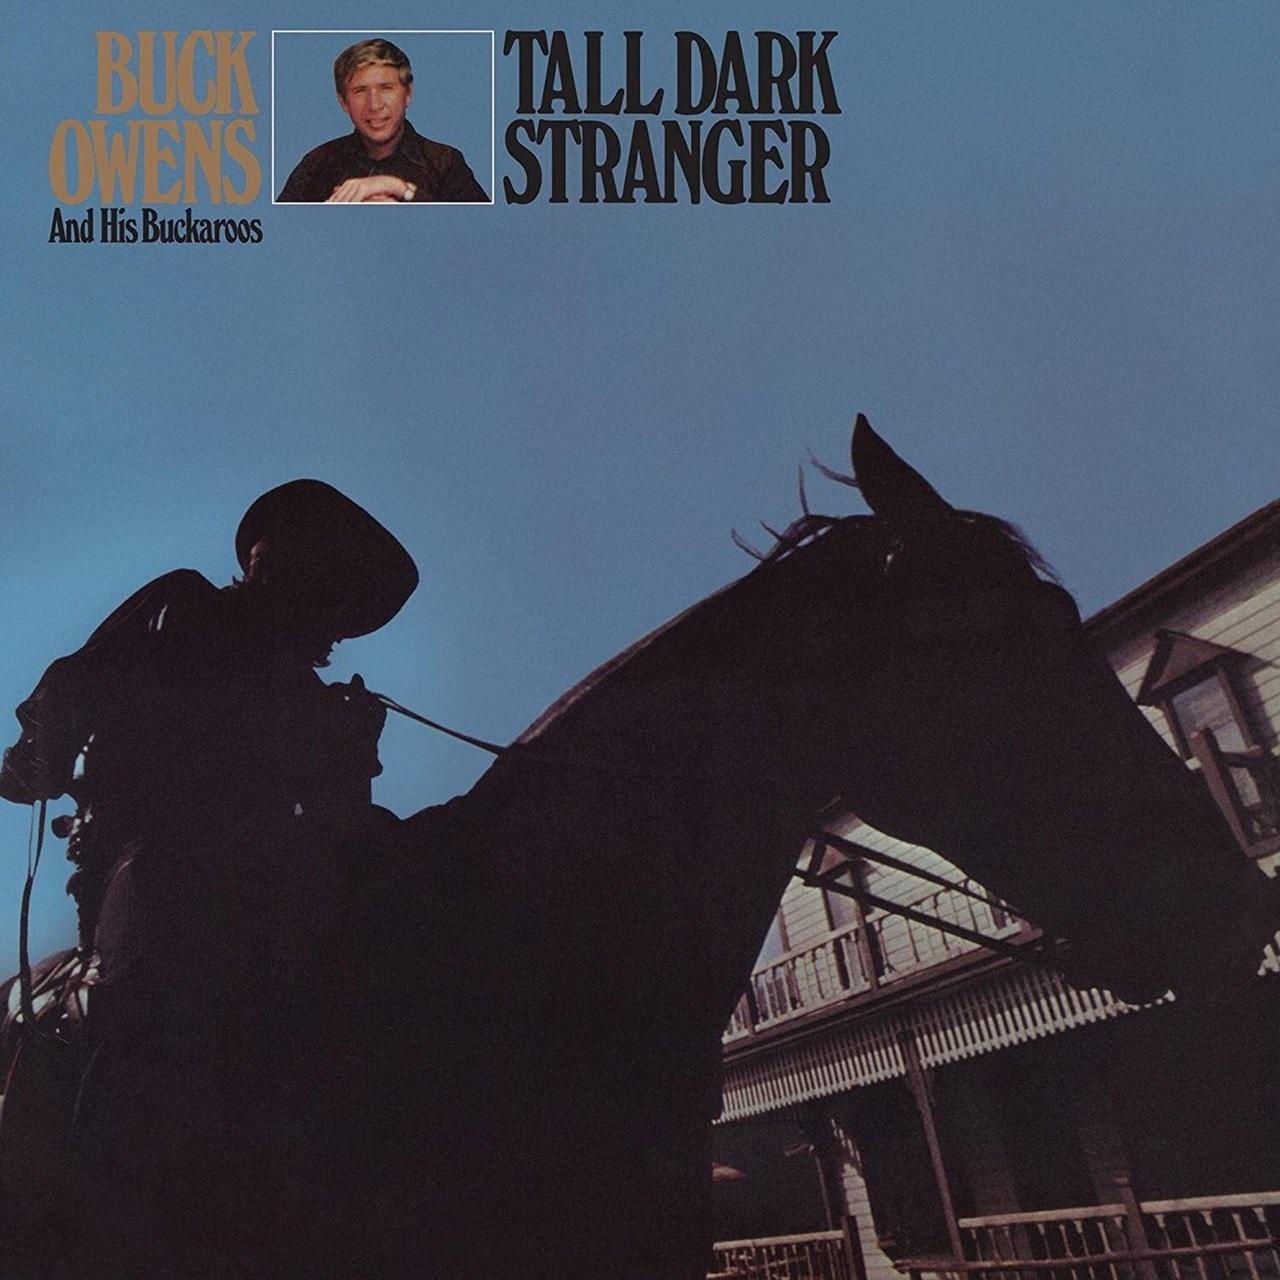 Tall Dark Stranger - 1